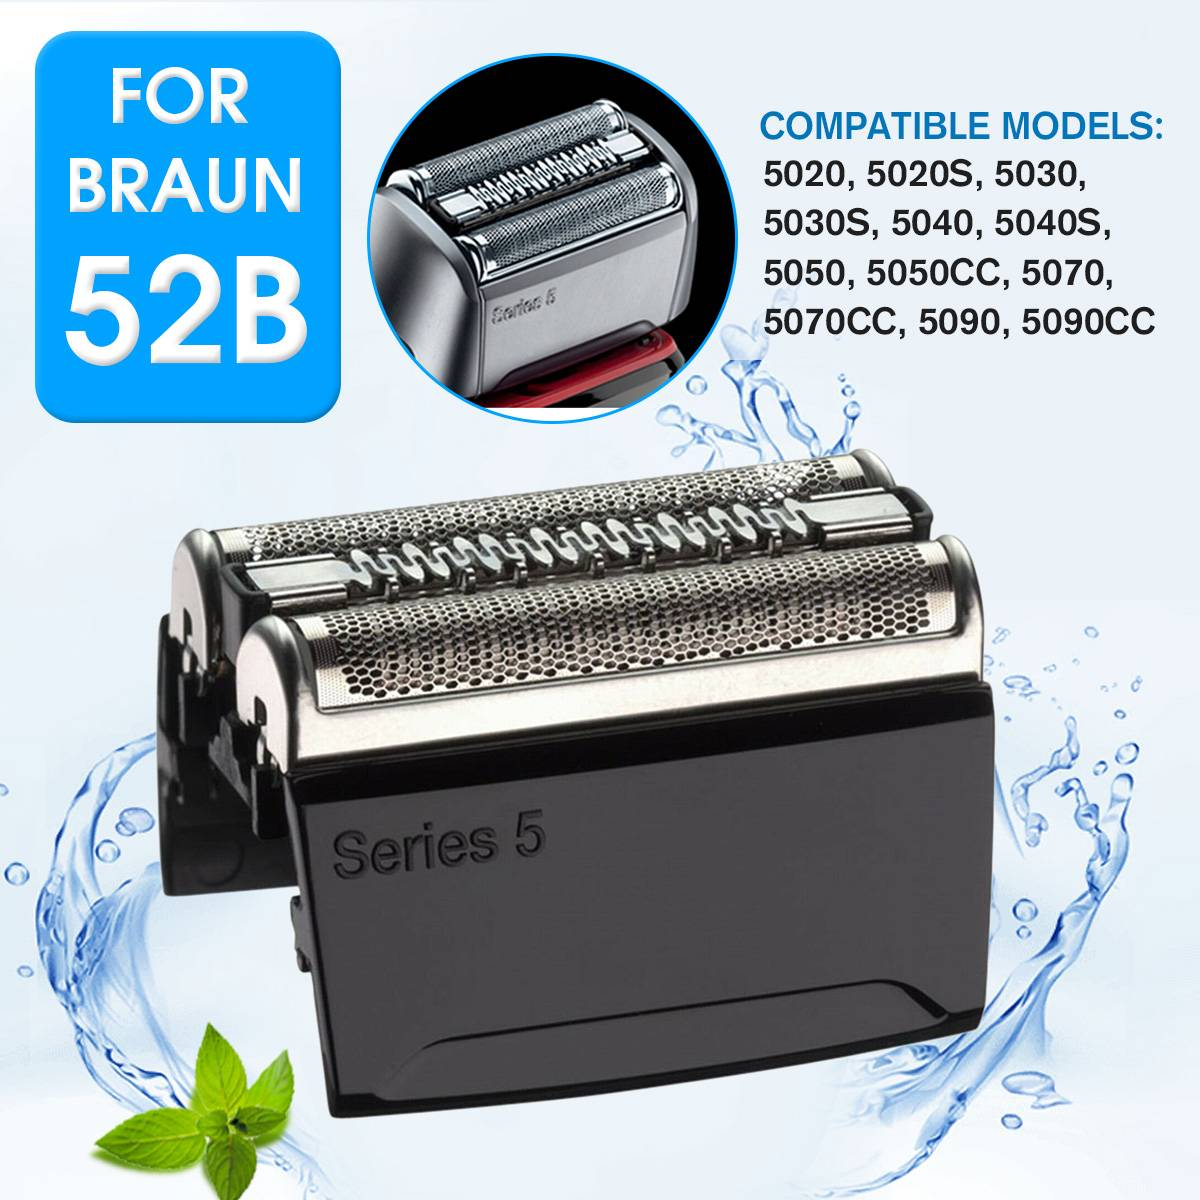 52B Replacement Shaver Foil Cutter Head For Braun Series 5 5020 5020s 5030 5030s 5040 5040s 5050 5050cc 5070 5070cc 5090 5090cc